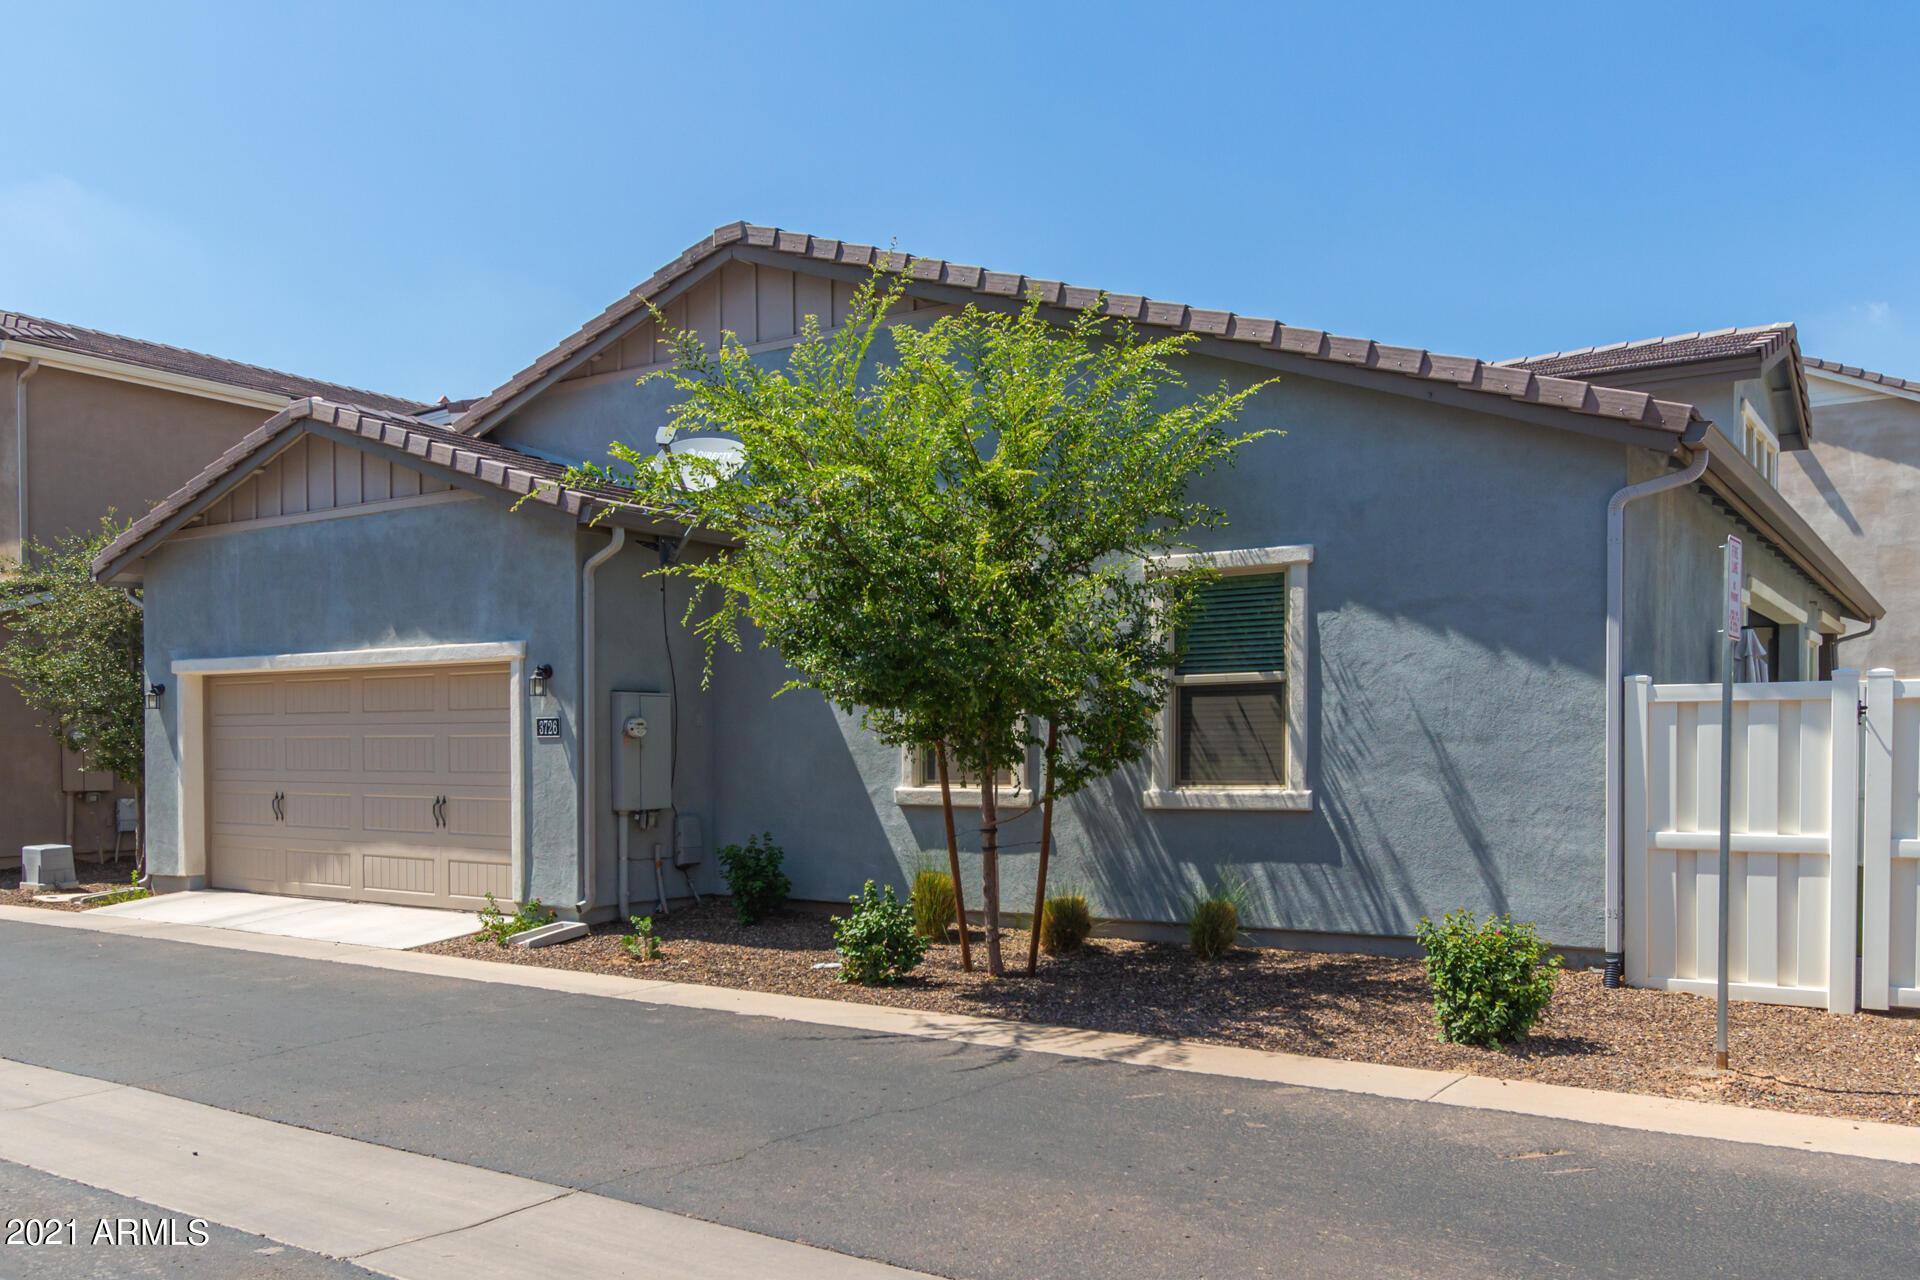 MLS 6268988 3726 E STILES Lane, Gilbert, AZ 85295 Gilbert AZ Cooley Station